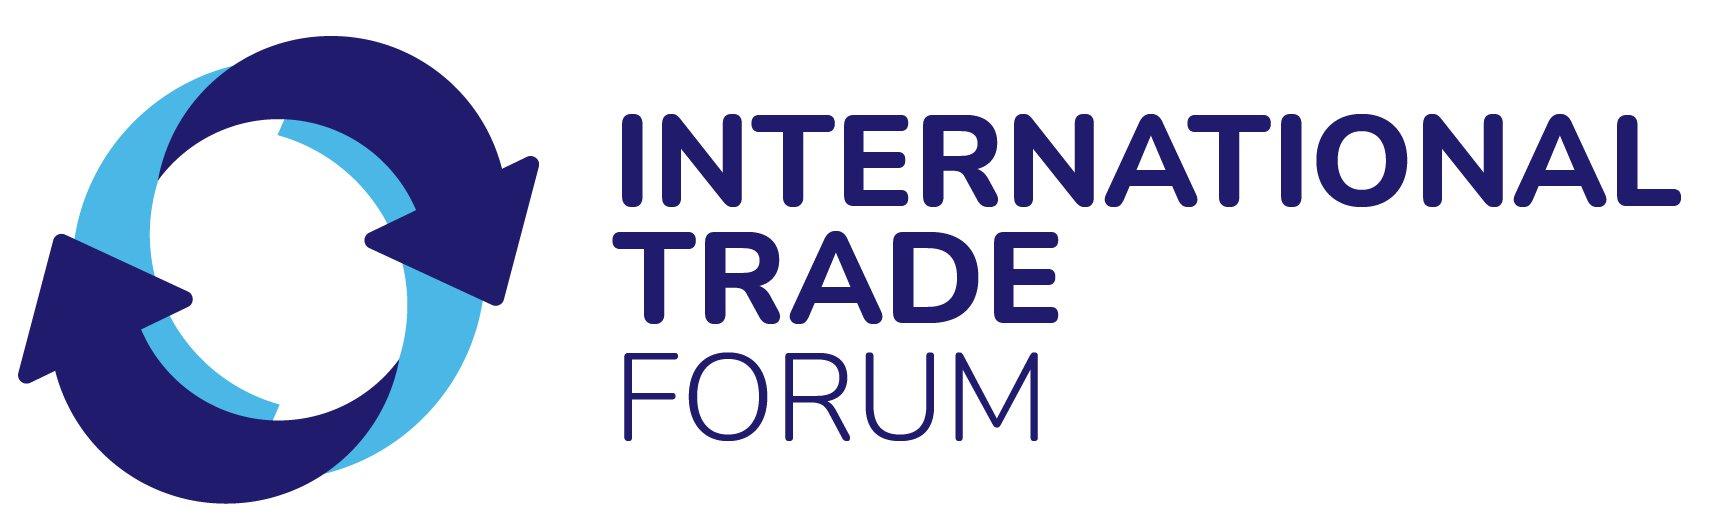 International Trade Forum Logo